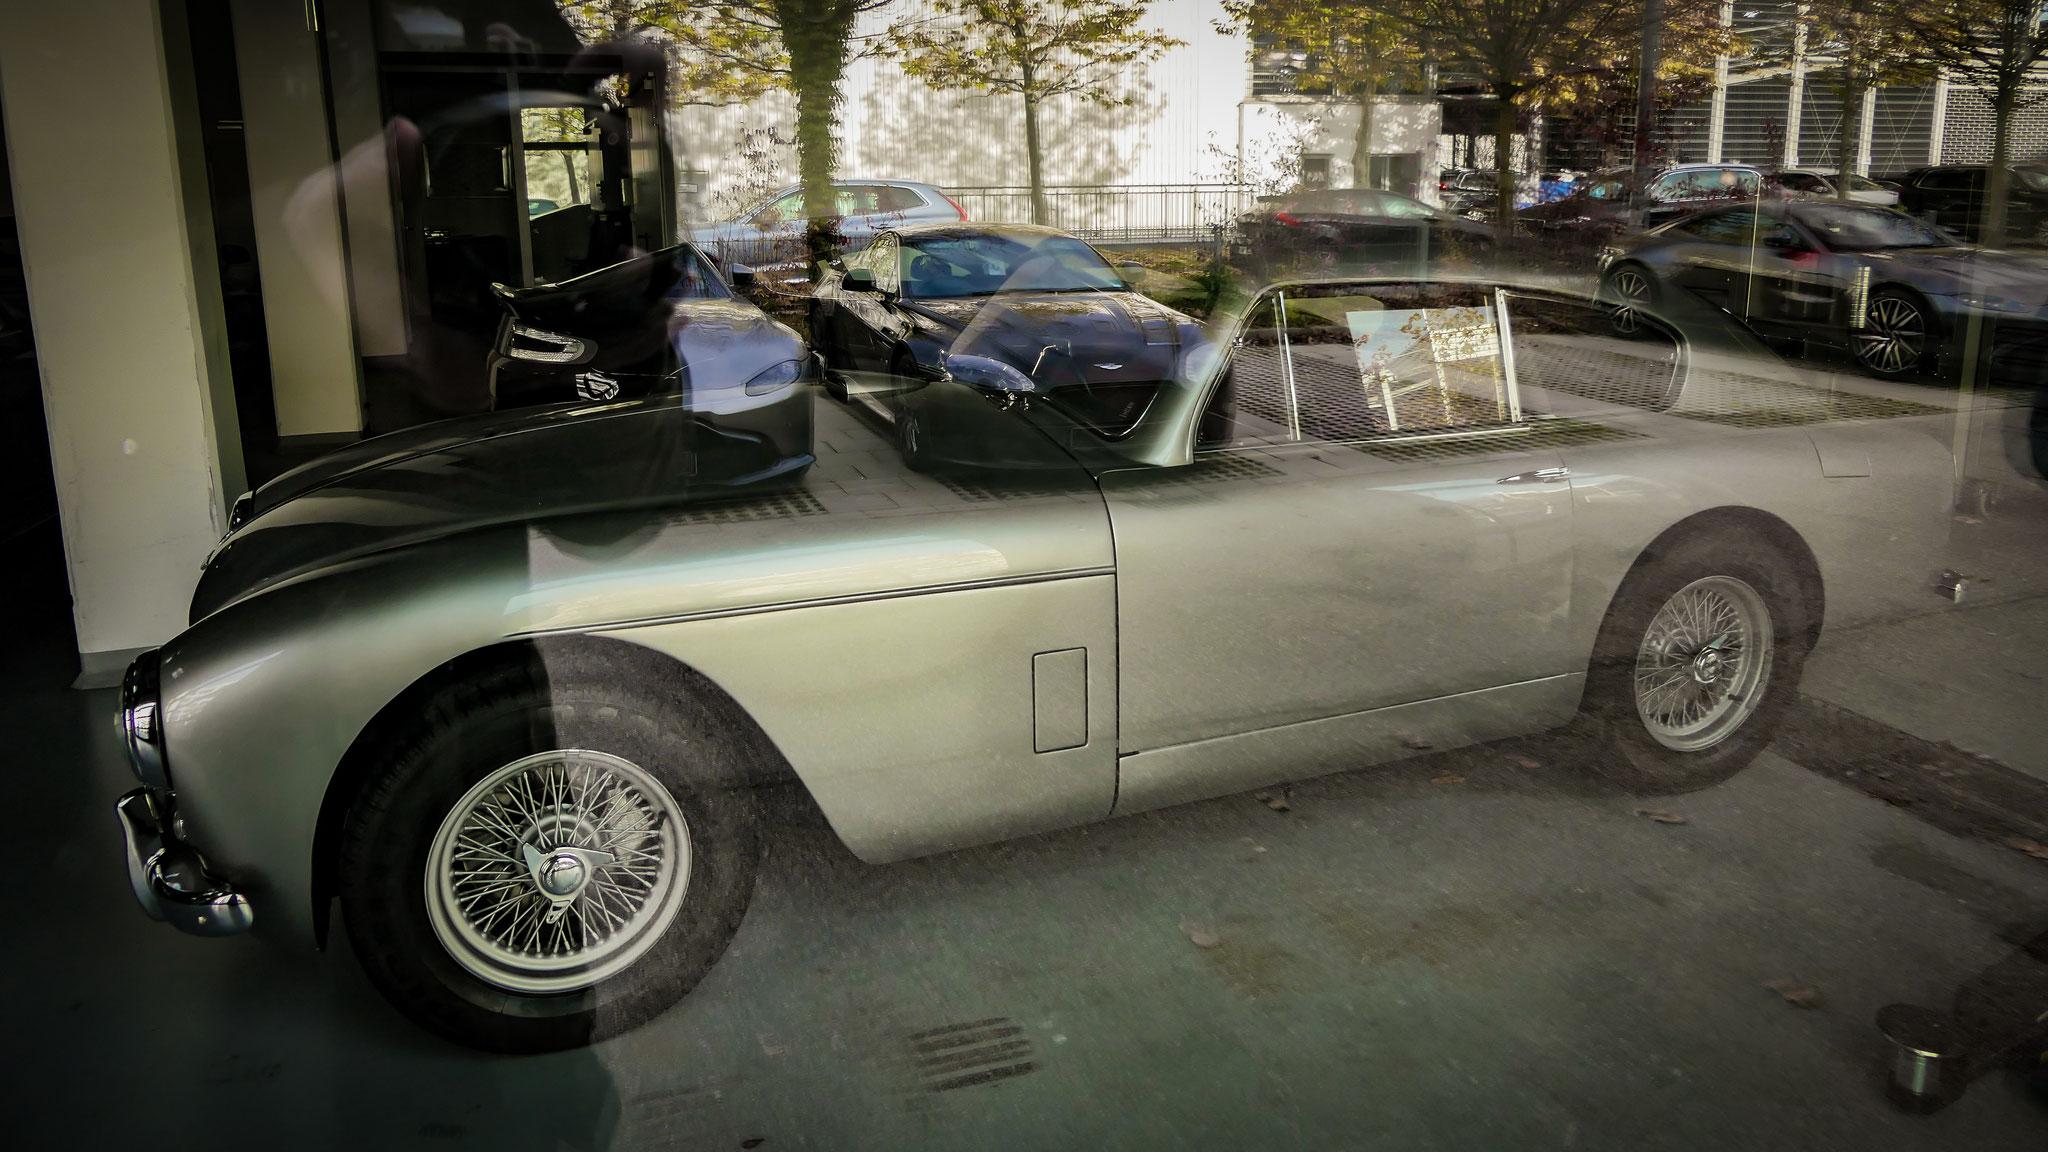 Aston Martin DB2/4 Mk III - UXW-387 (GB)